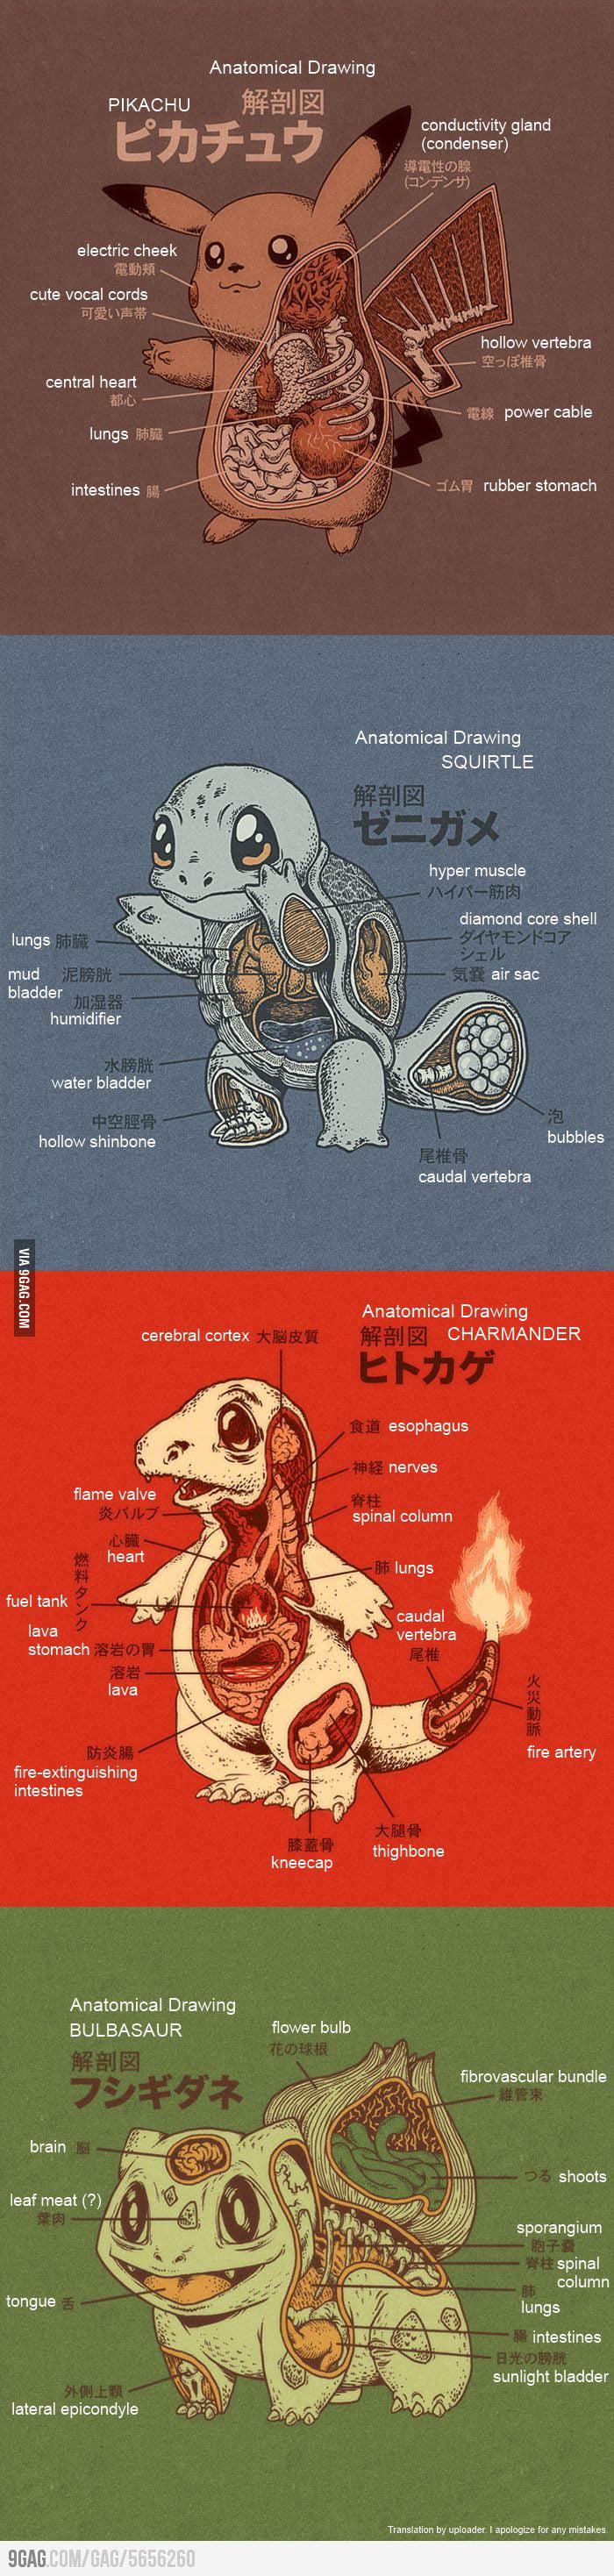 Pokemon Anatomy English Translation 9gag